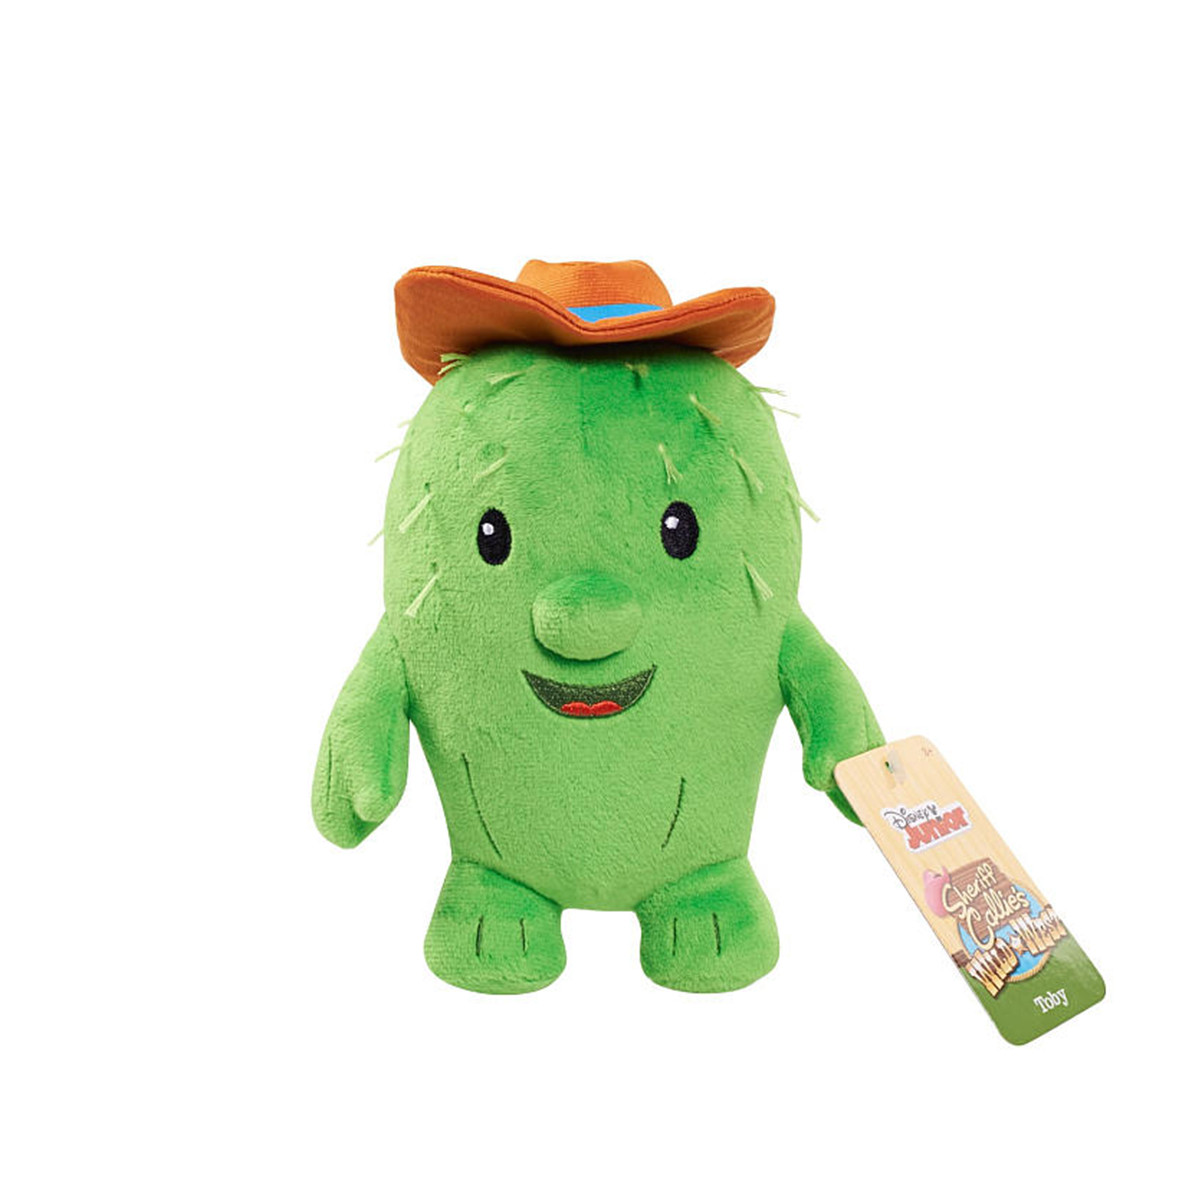 Sheriff Callie Мягкая игрушка Шериф Келли - Тоби, 66023